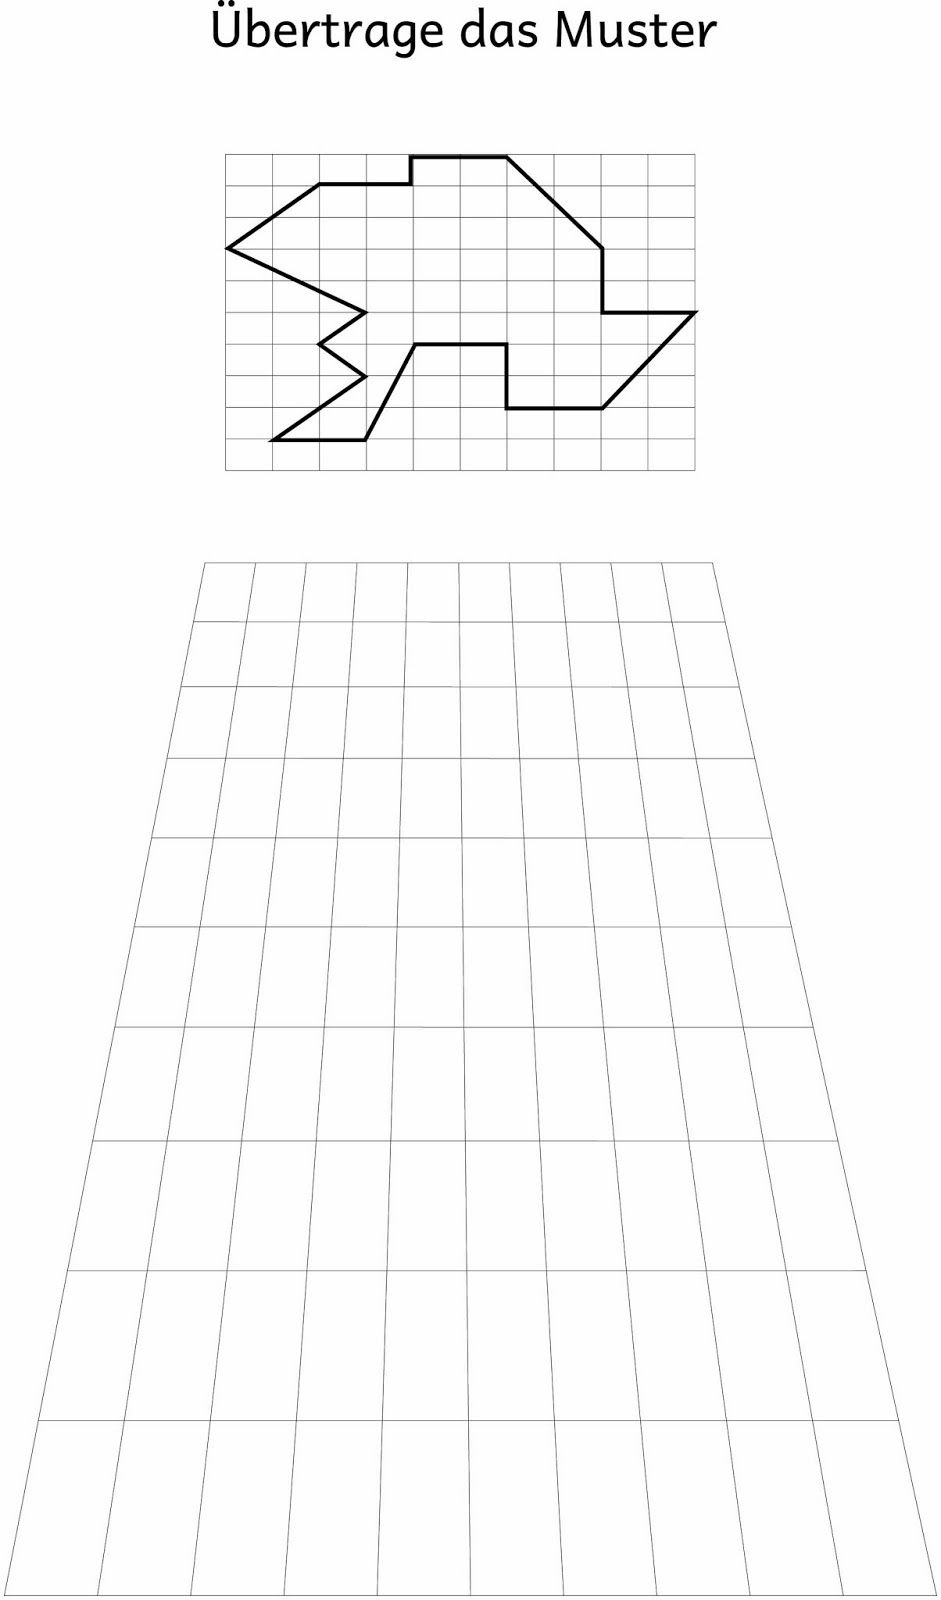 Muster verzerren (1) | Muster, Kindersachen und Mathe